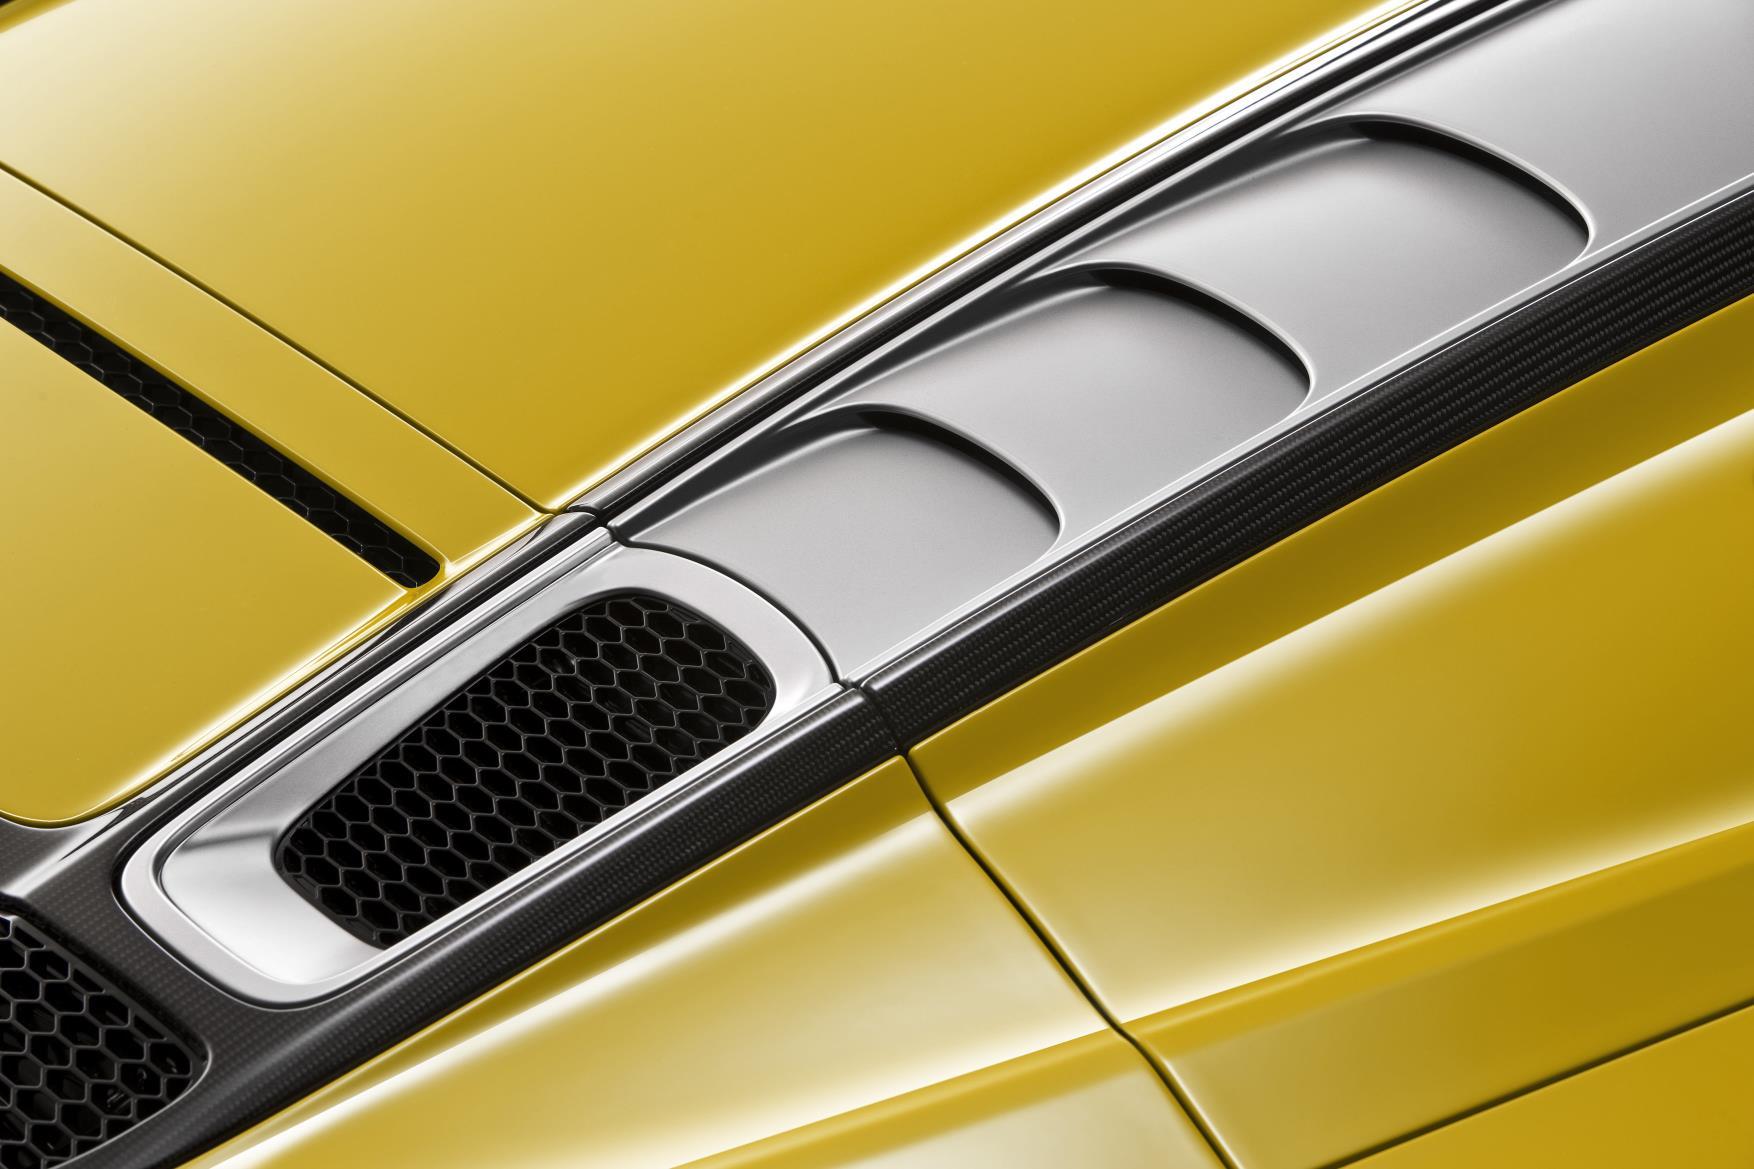 Discover the future of cars and transportation technology via @carsfera www.carsfera.com #cars #autoshow #conceptcars #conceptvehicles #bestcarstobuy #showroom #testdrive #safecar #safestcars #cars2017 #cars2018 #cars2016 #AudiR8SpyderV10